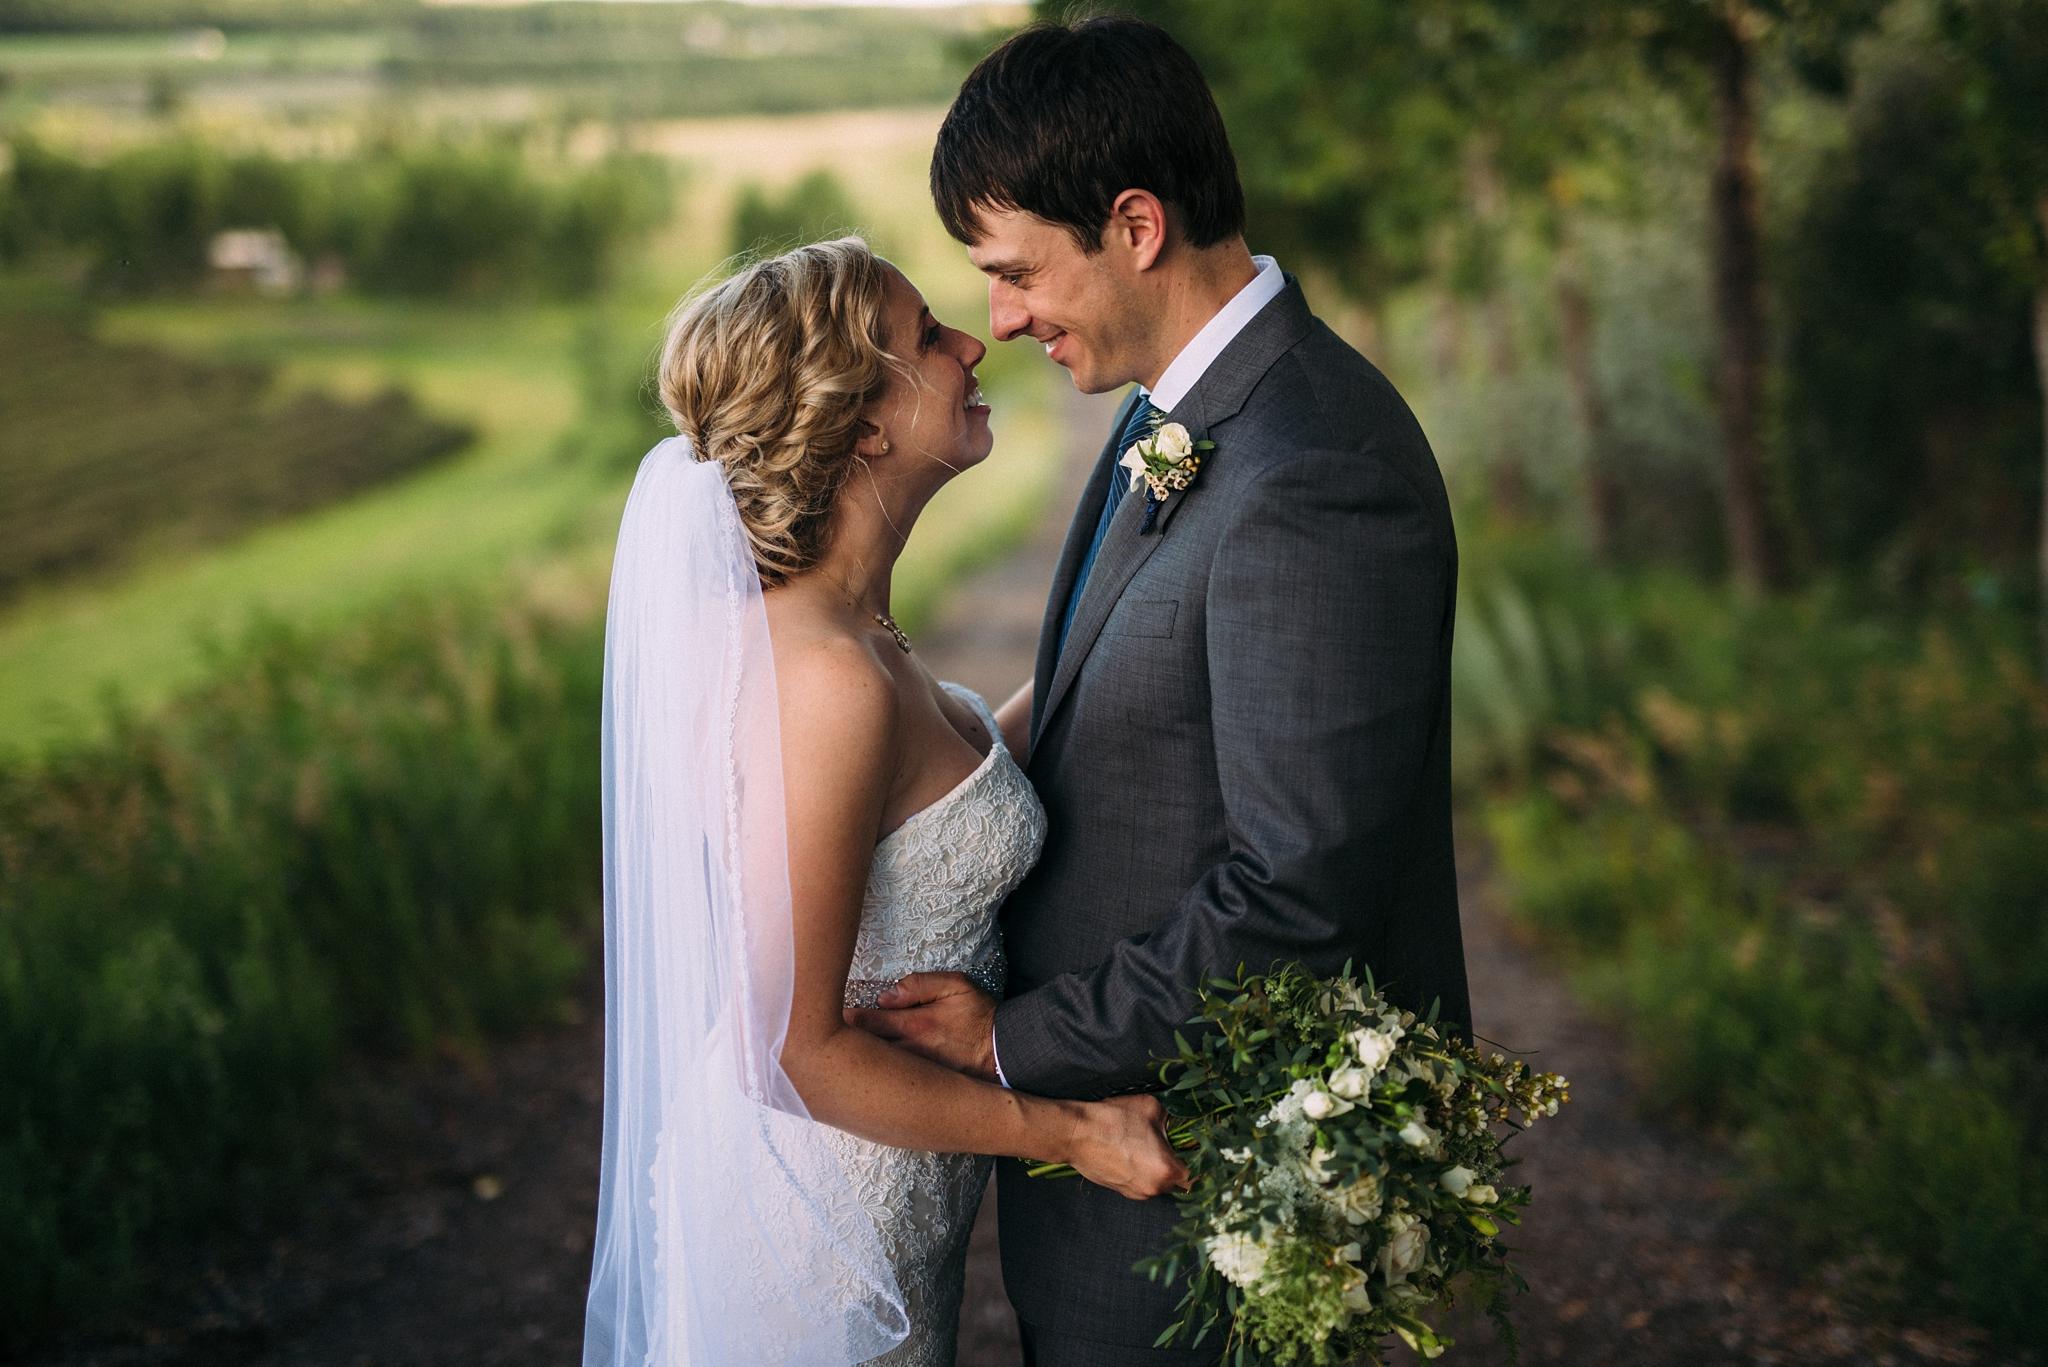 kaihla_tonai_intimate_wedding_elopement_photographer_4331